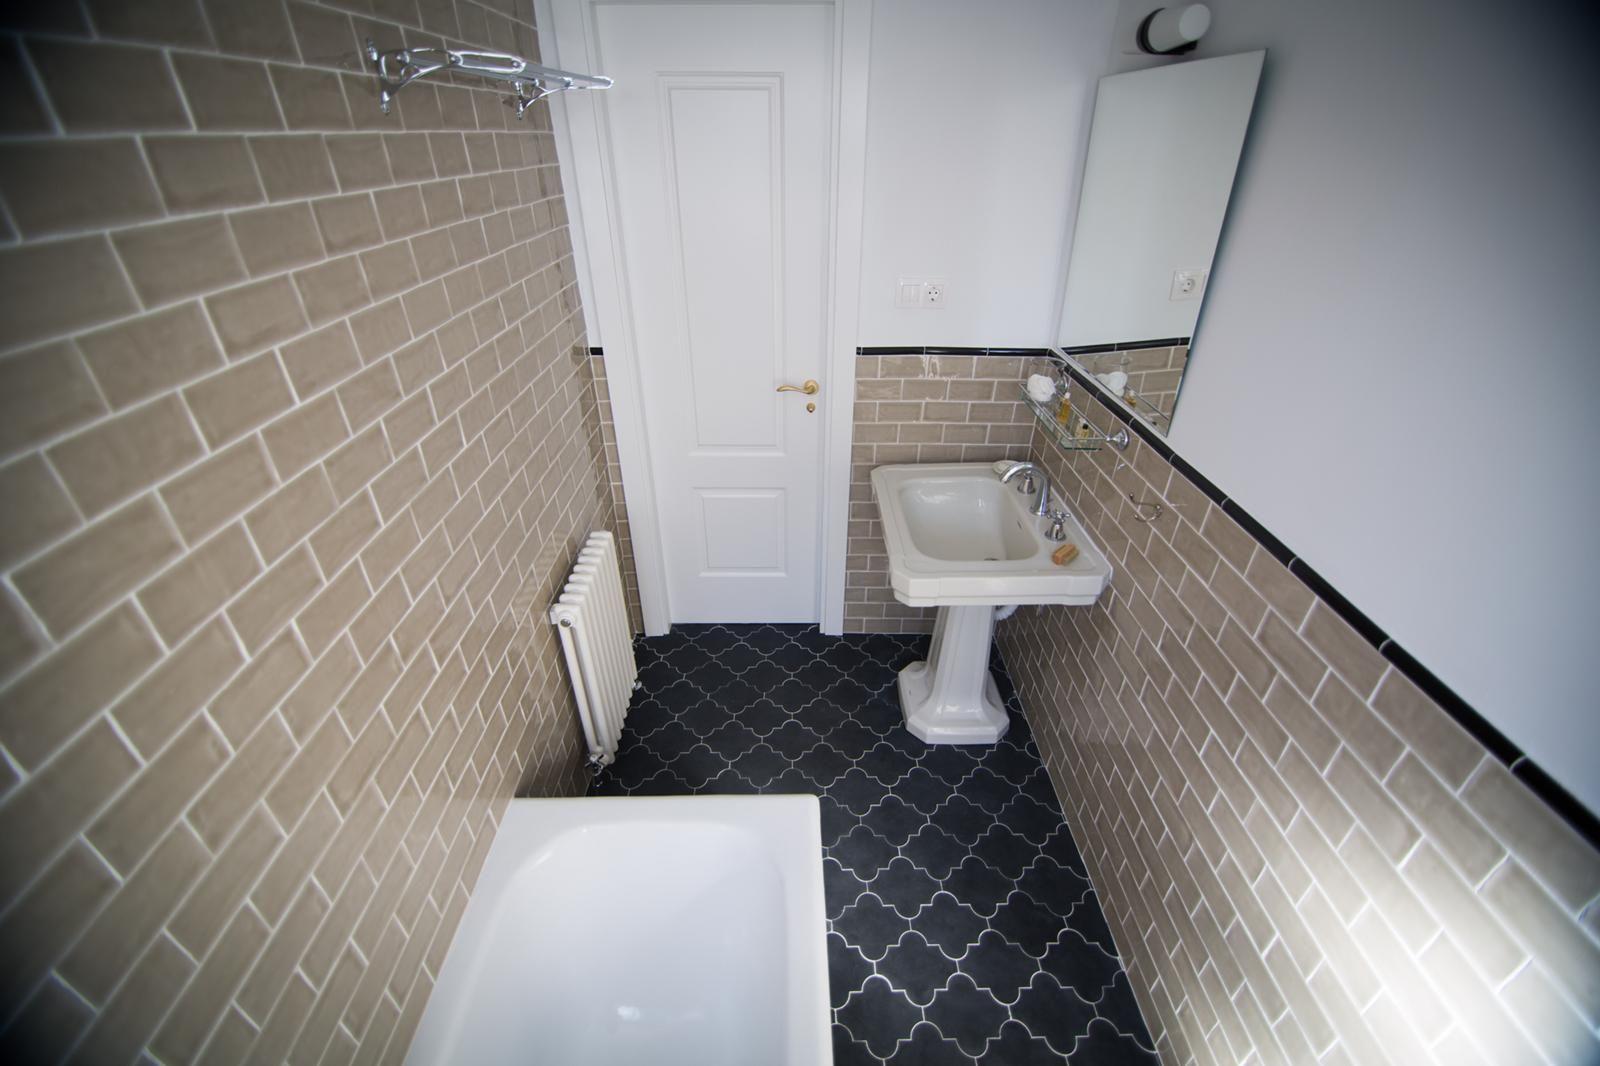 Pin en Baño / Bathroom